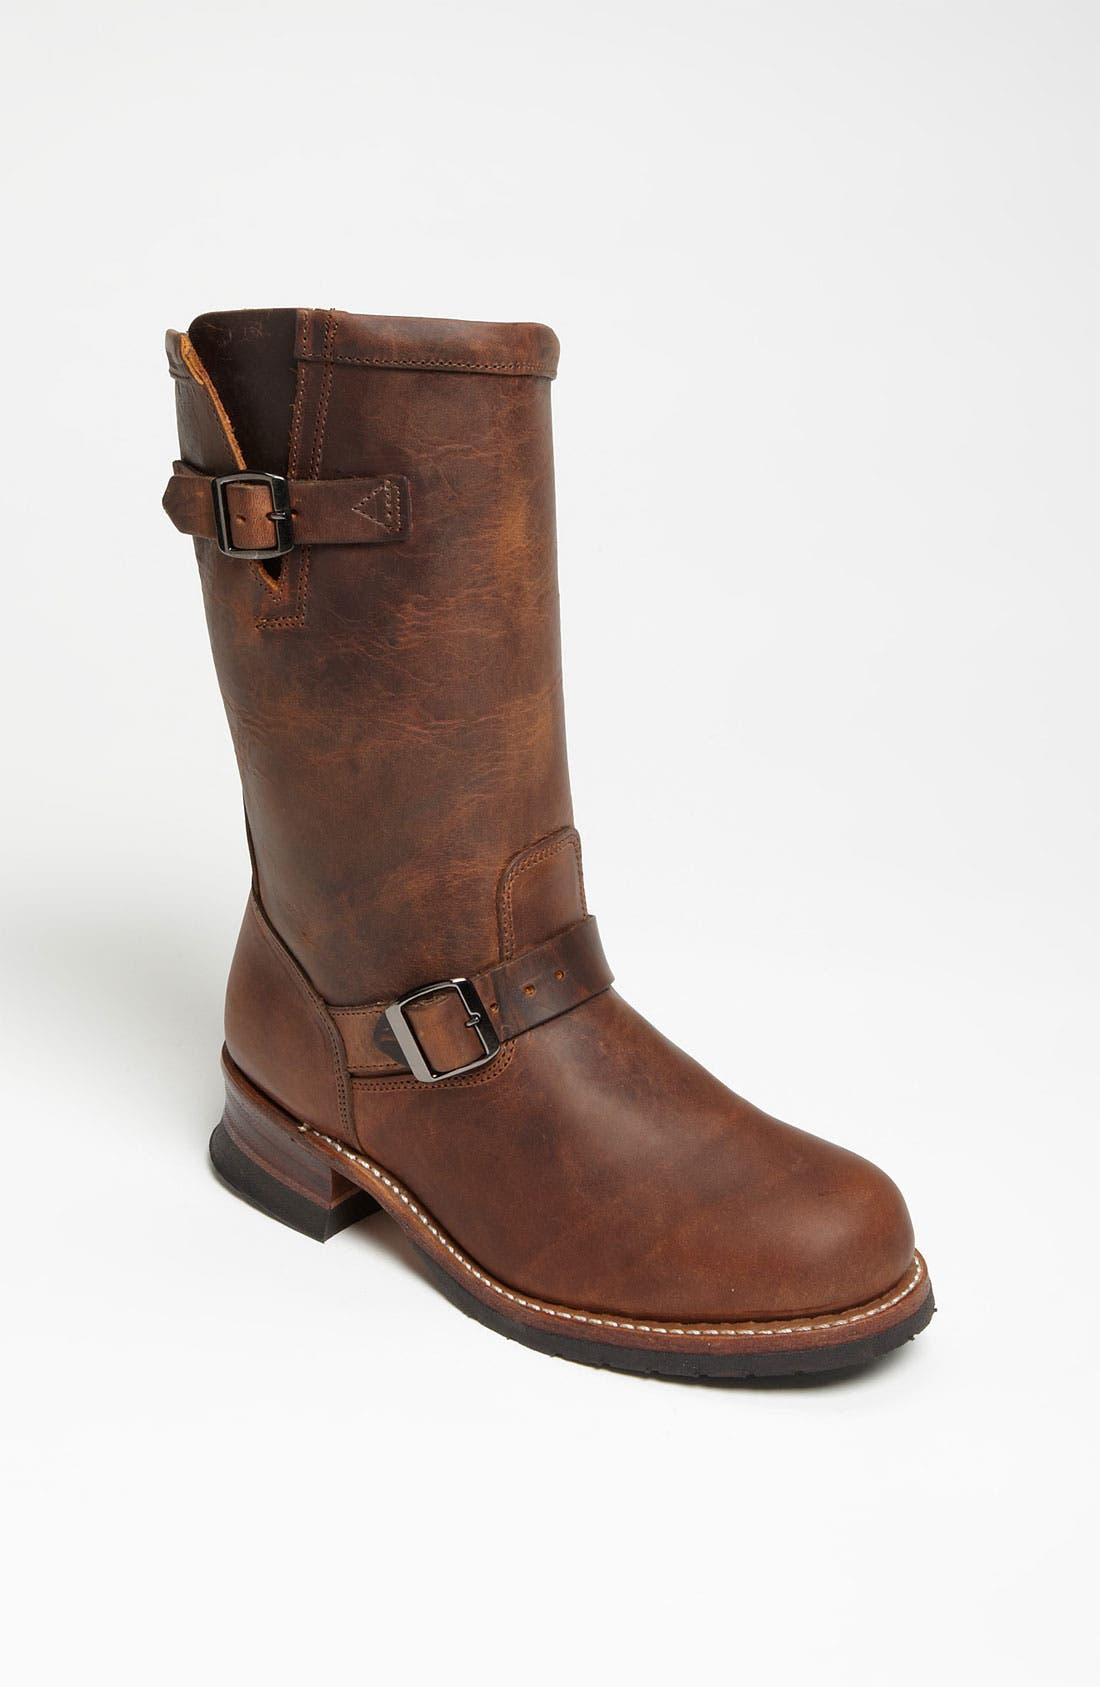 Main Image - Wolverine '1000 Mile - Stockton' Boot